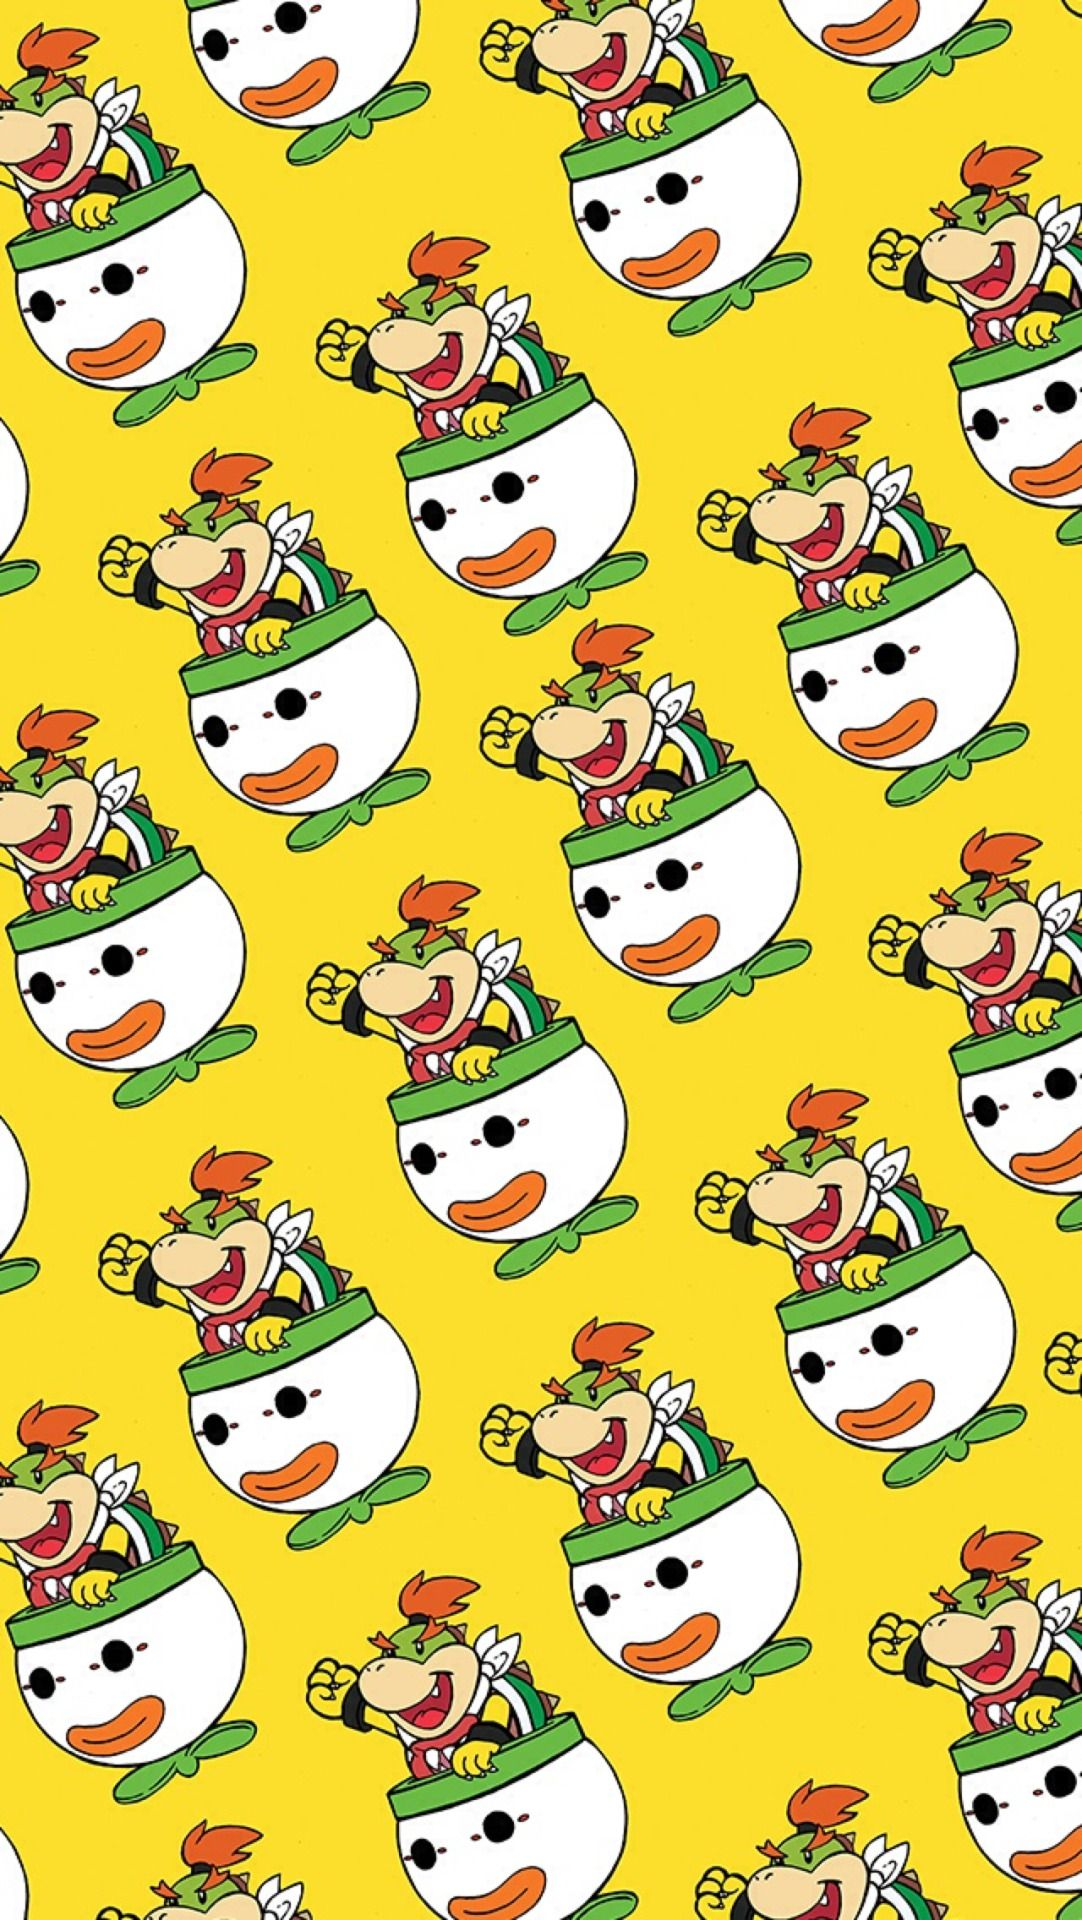 Bowser Jr Mobile Wallpaper Nintendo 39349964 1082 1920 Png 1 082 1 920 Pixels Bowser Mario Bros Mobile Wallpaper